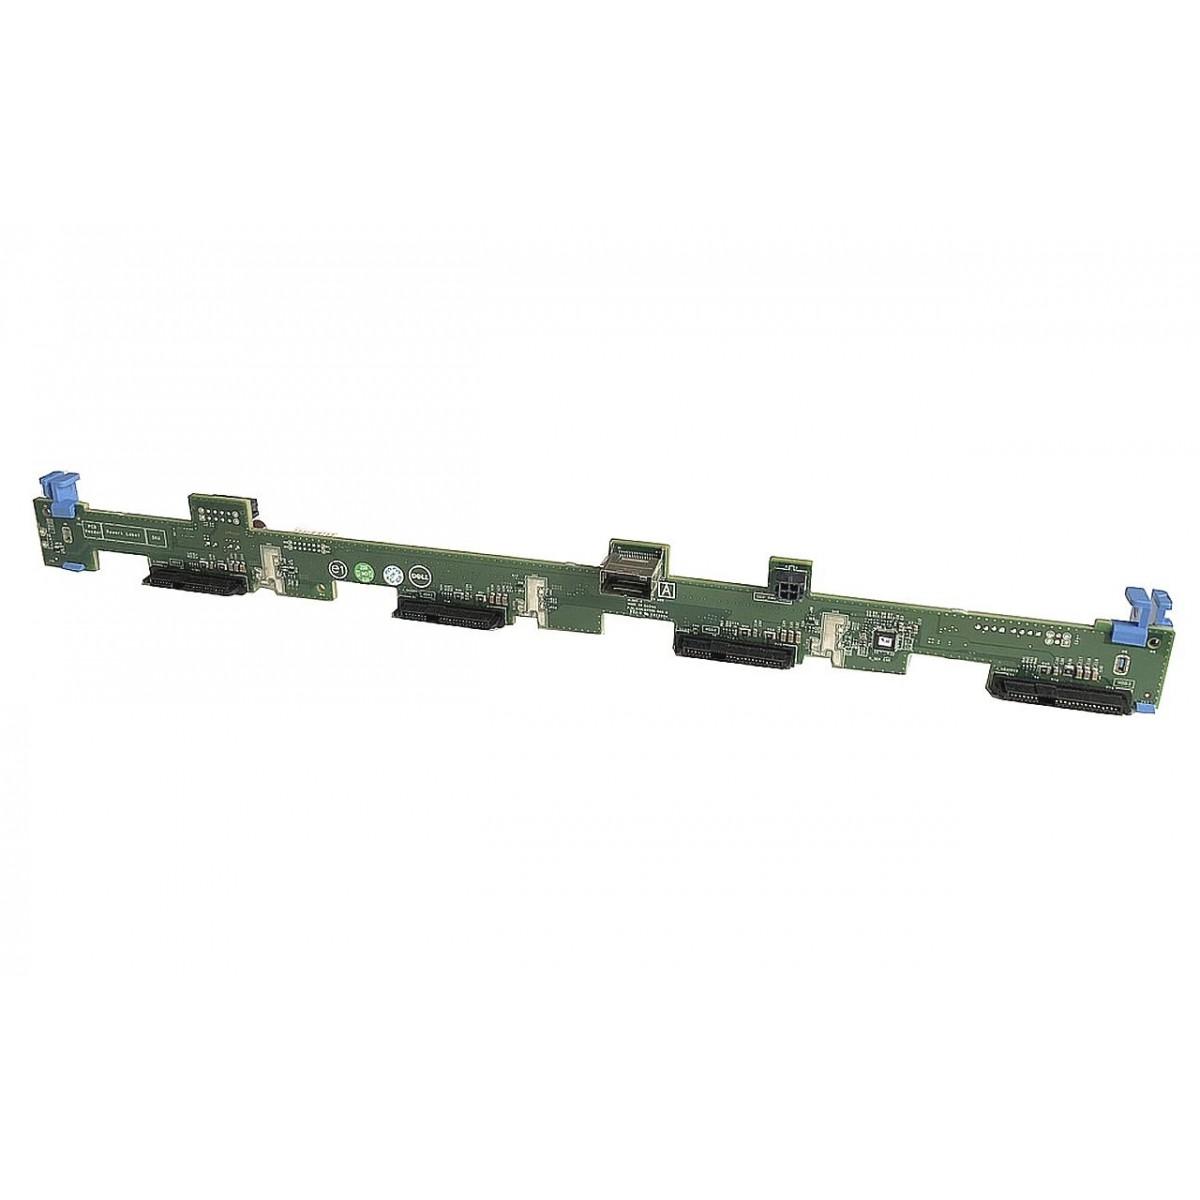 LENOVO M92p 3.40 i5 3570 4GB 500GB SATA WIN10 PRO